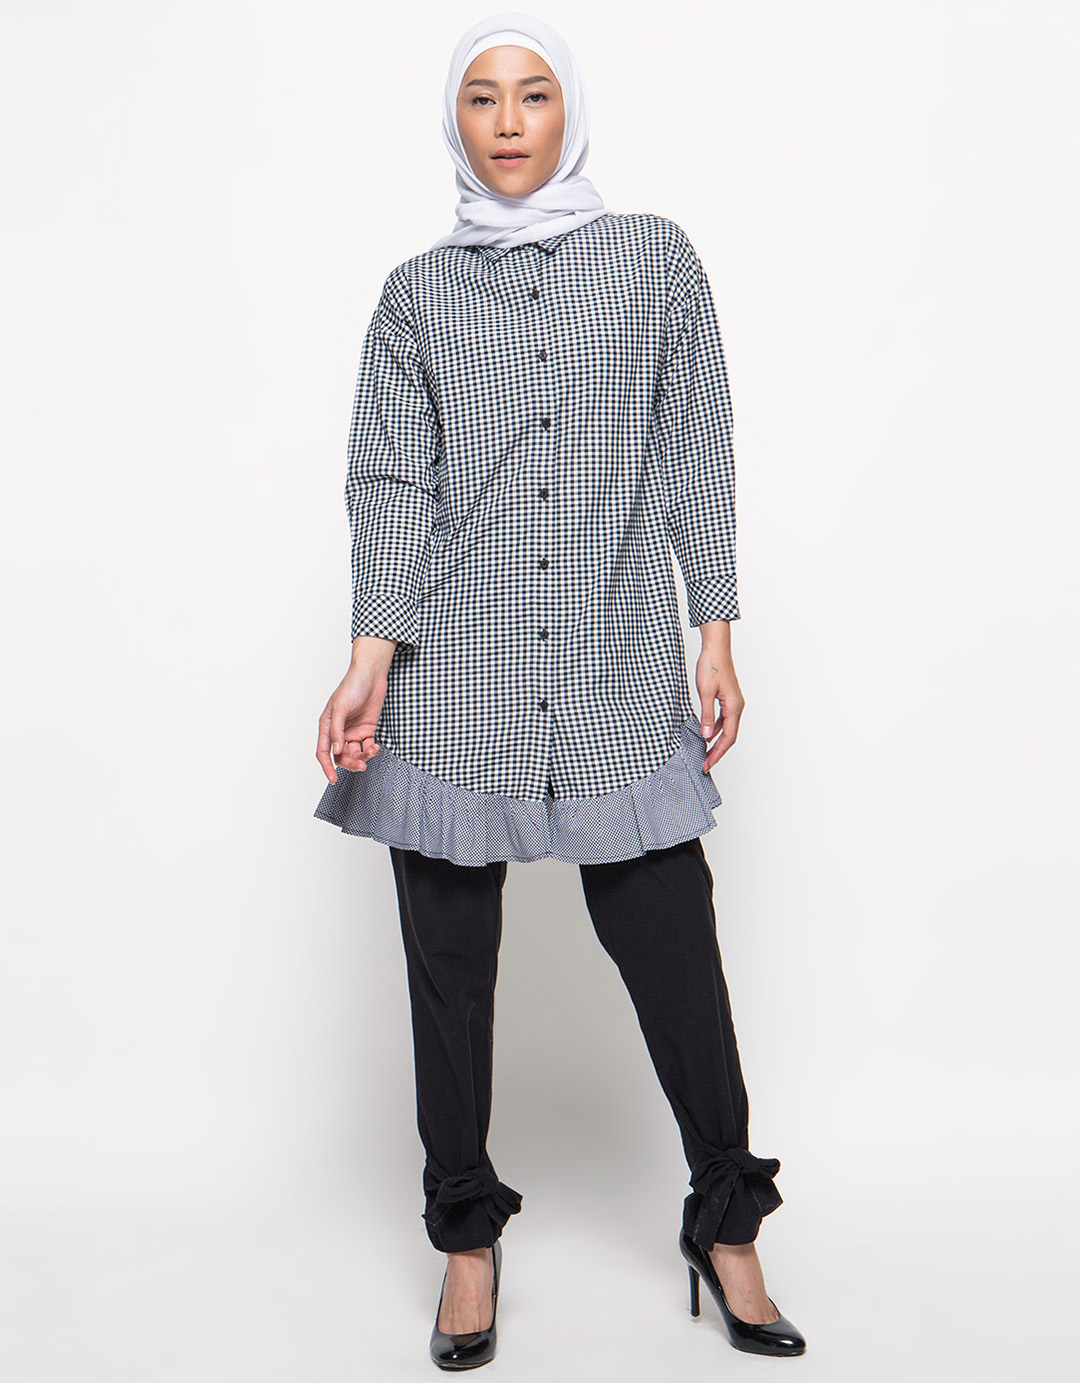 annisa-blouse-wanita-square-combination-hitam_4398884_4_54271.jpg